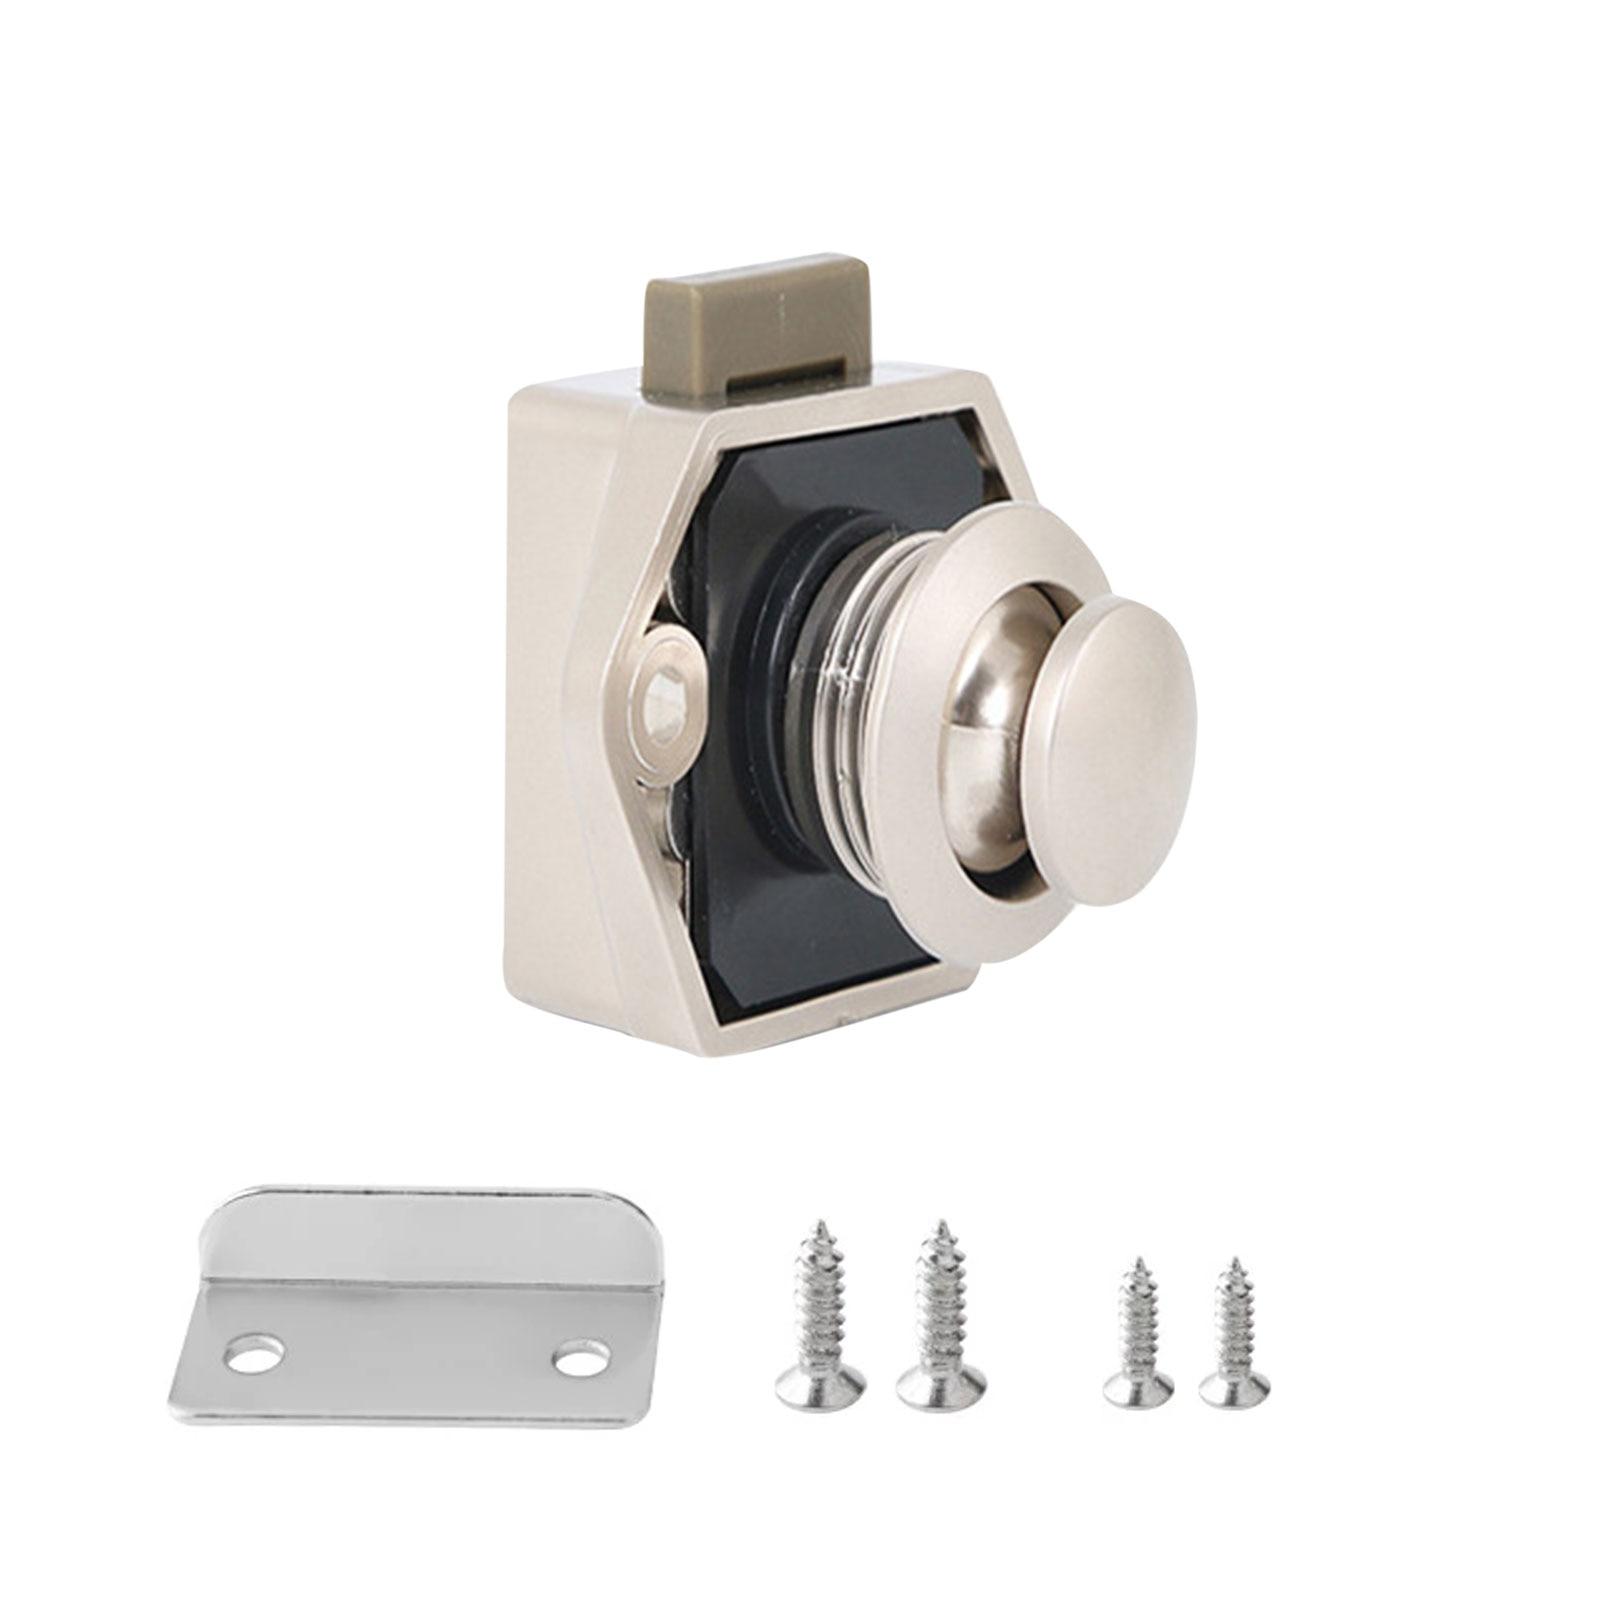 1pc 20mm Camper Car Push Lock RV Caravan Boat Motor Home Cabinet Drawer Latch Button Locks For RV Furniture Hardware Expert